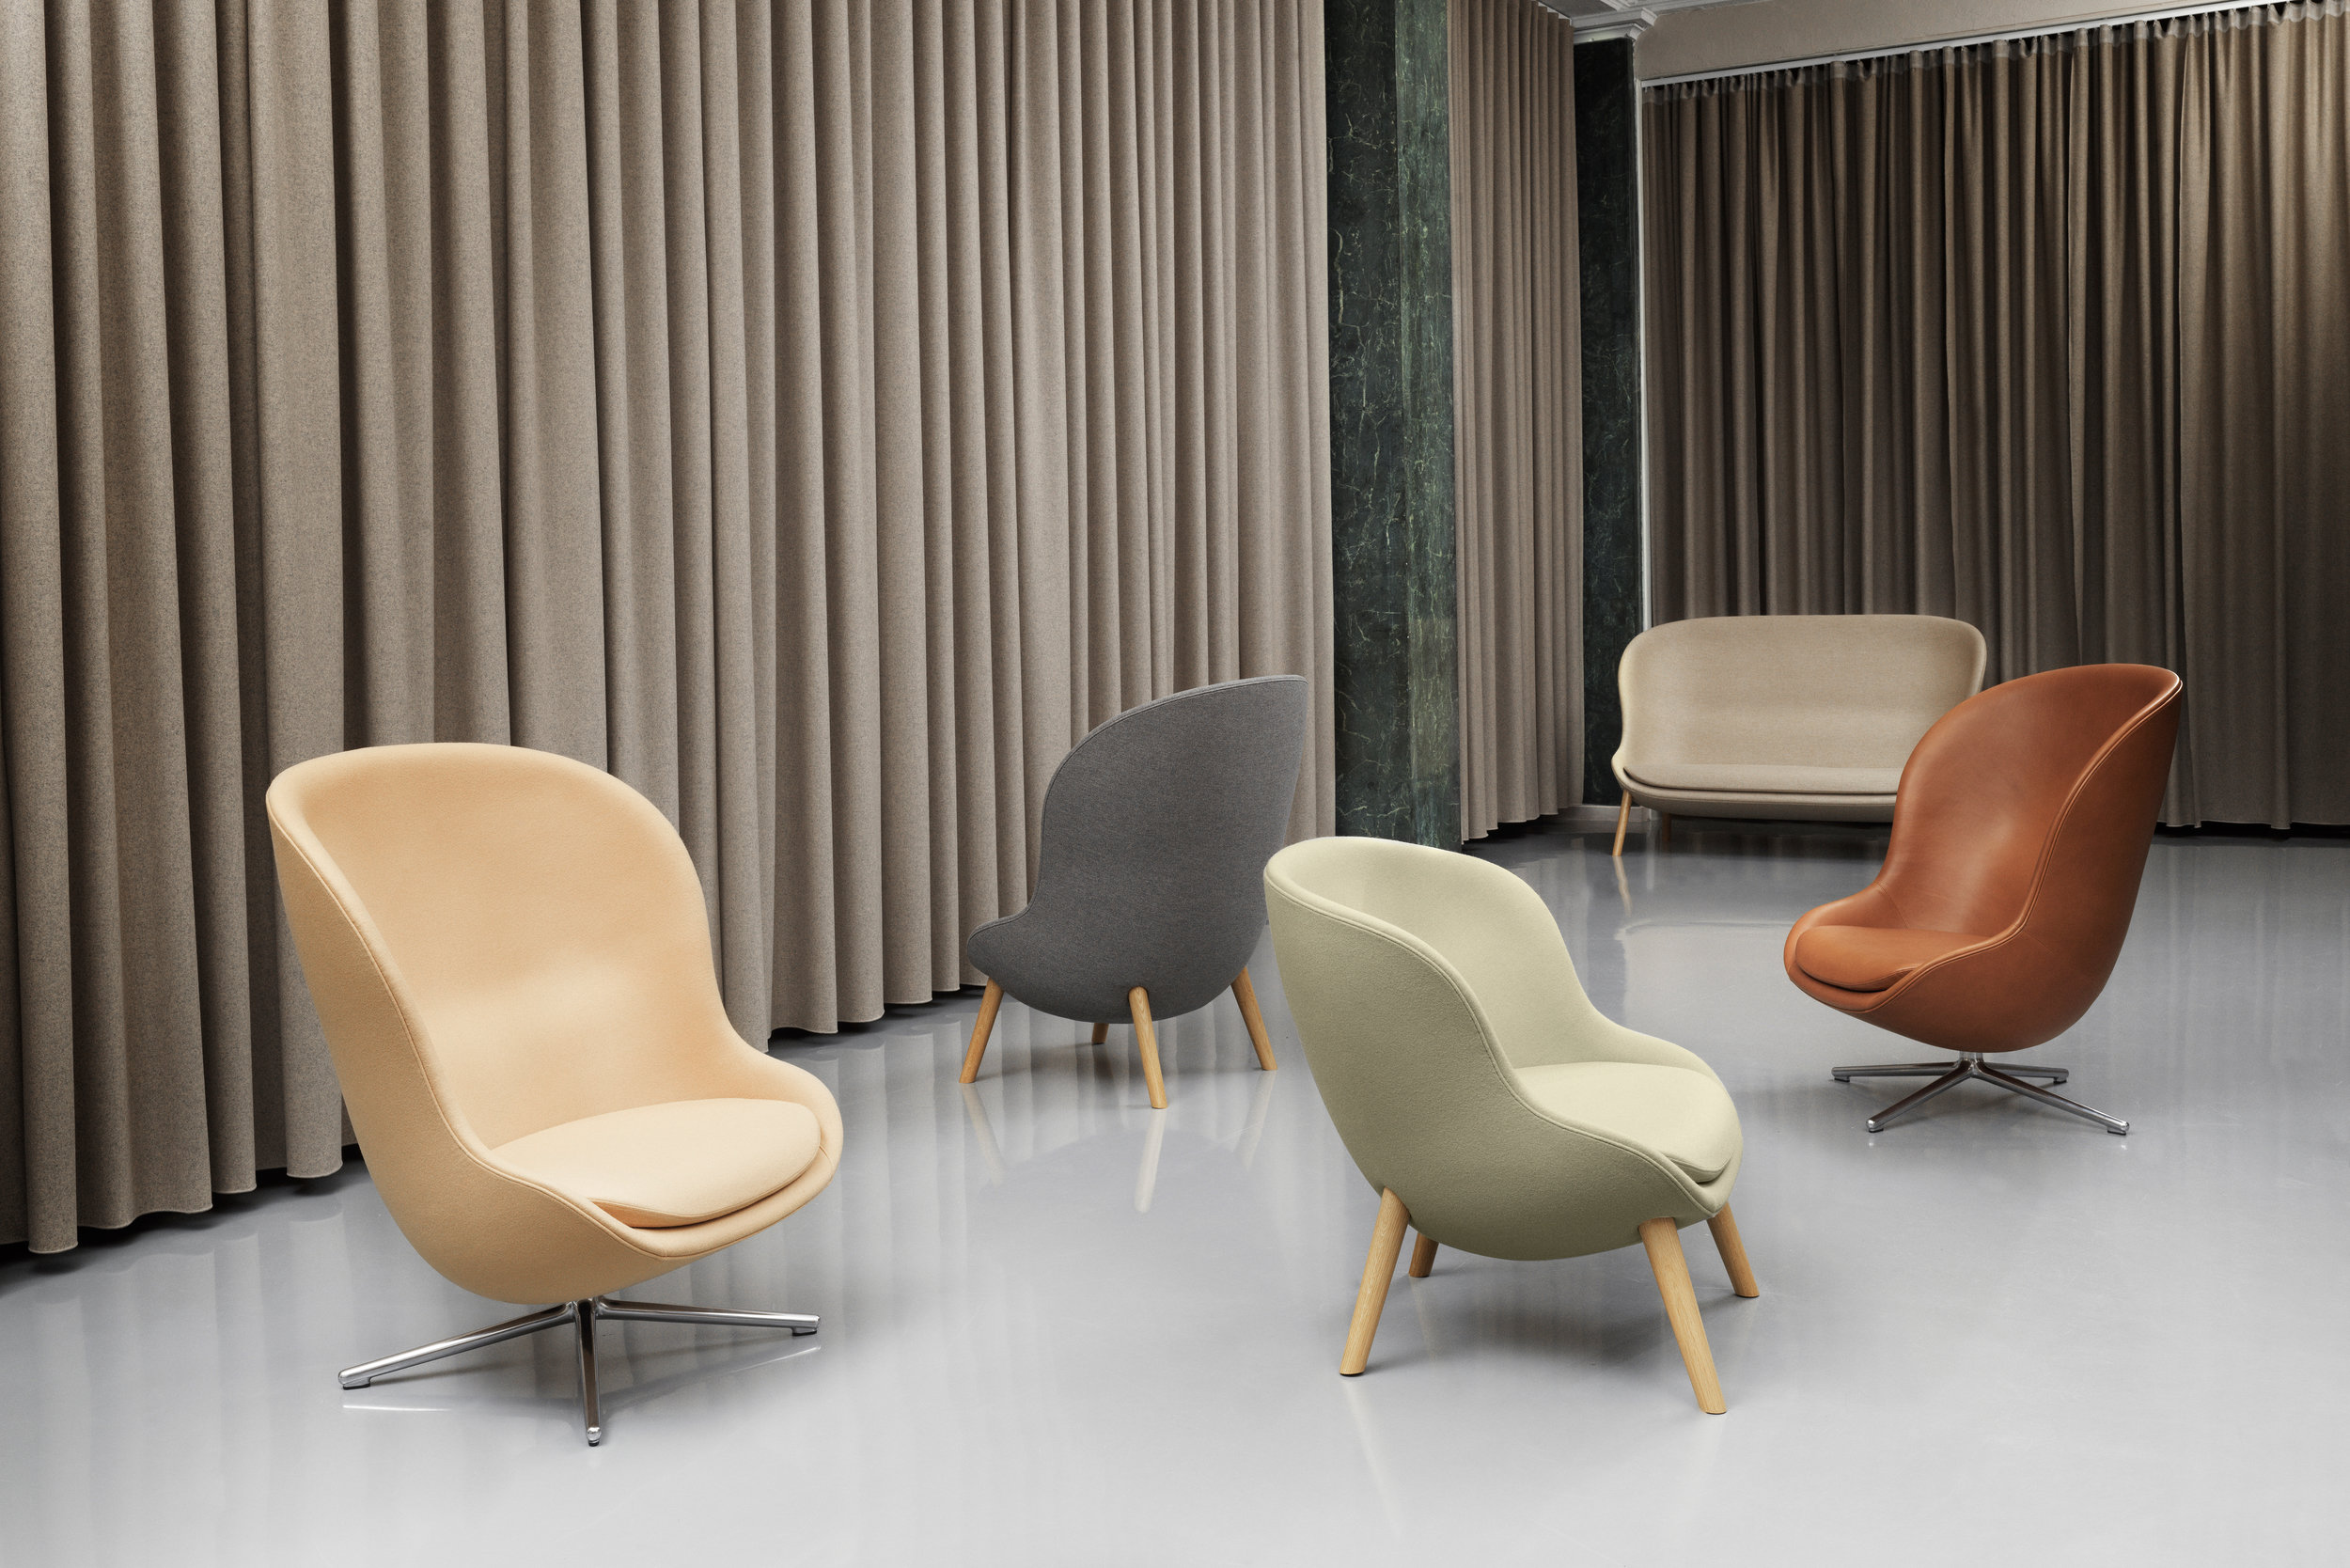 norman-copenhagen-hug-lounge-chair-living-scandinavian-home-texture-variations.jpg